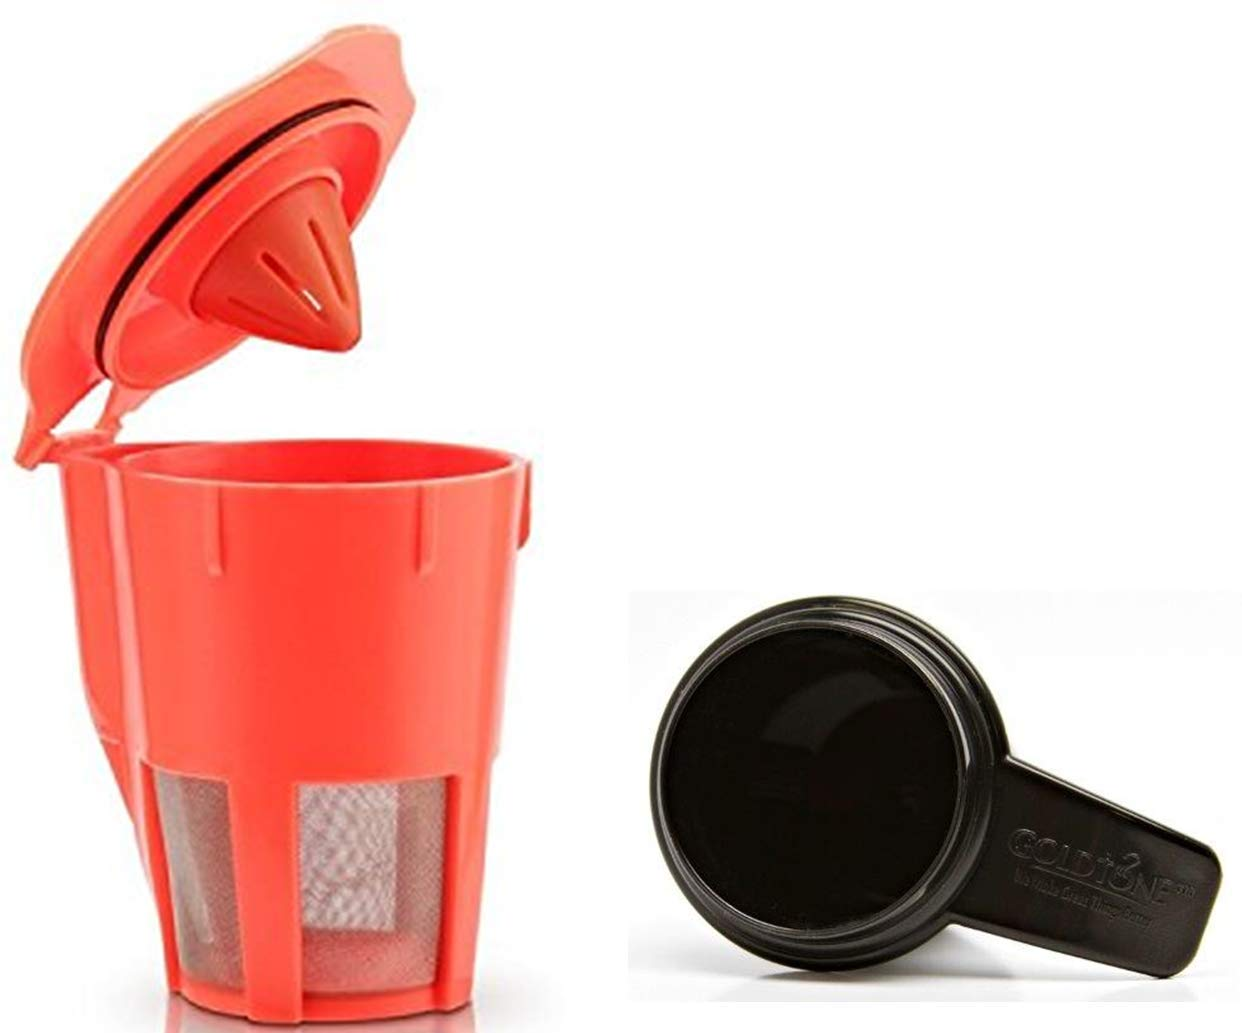 GoldTone Brand Reusable Coffee Filter comapatible with Keurig 2.0 K200, K300, K400, K500 Series, and K Carafe K Cup (Carafe filter + Scoop)